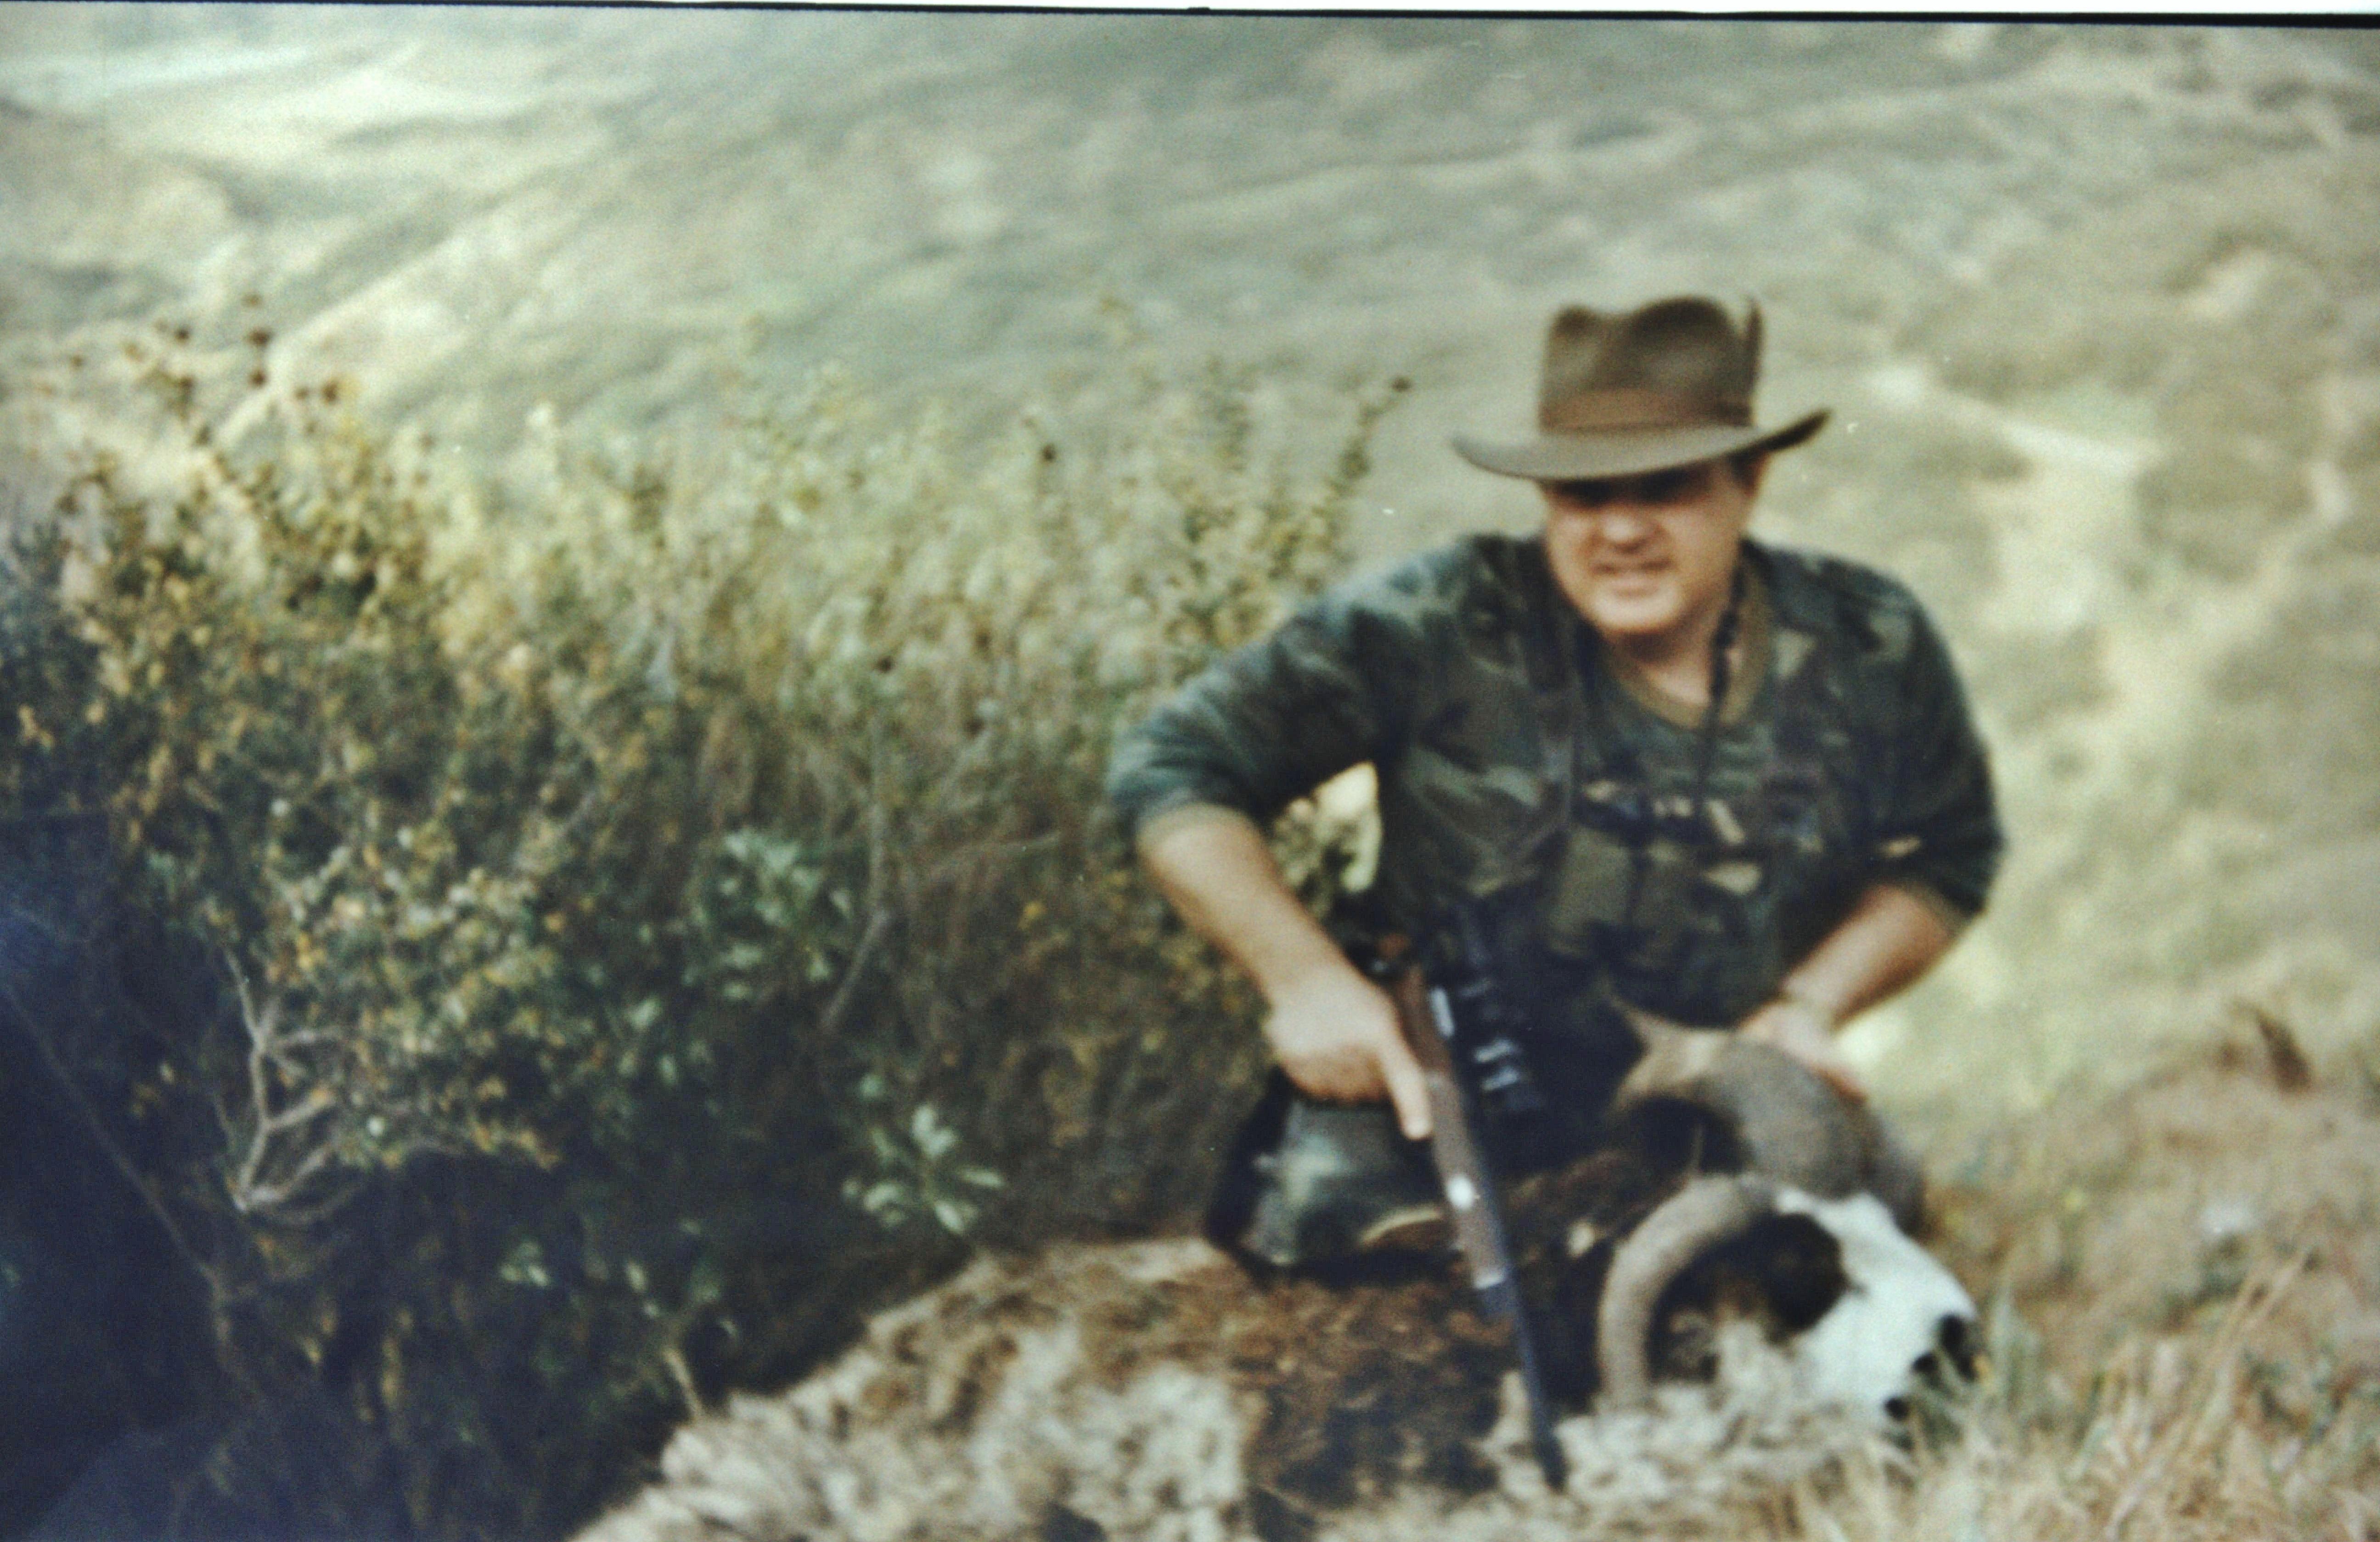 Top Ten Four Horn Sheep taken with XP-100 in .35 Remington